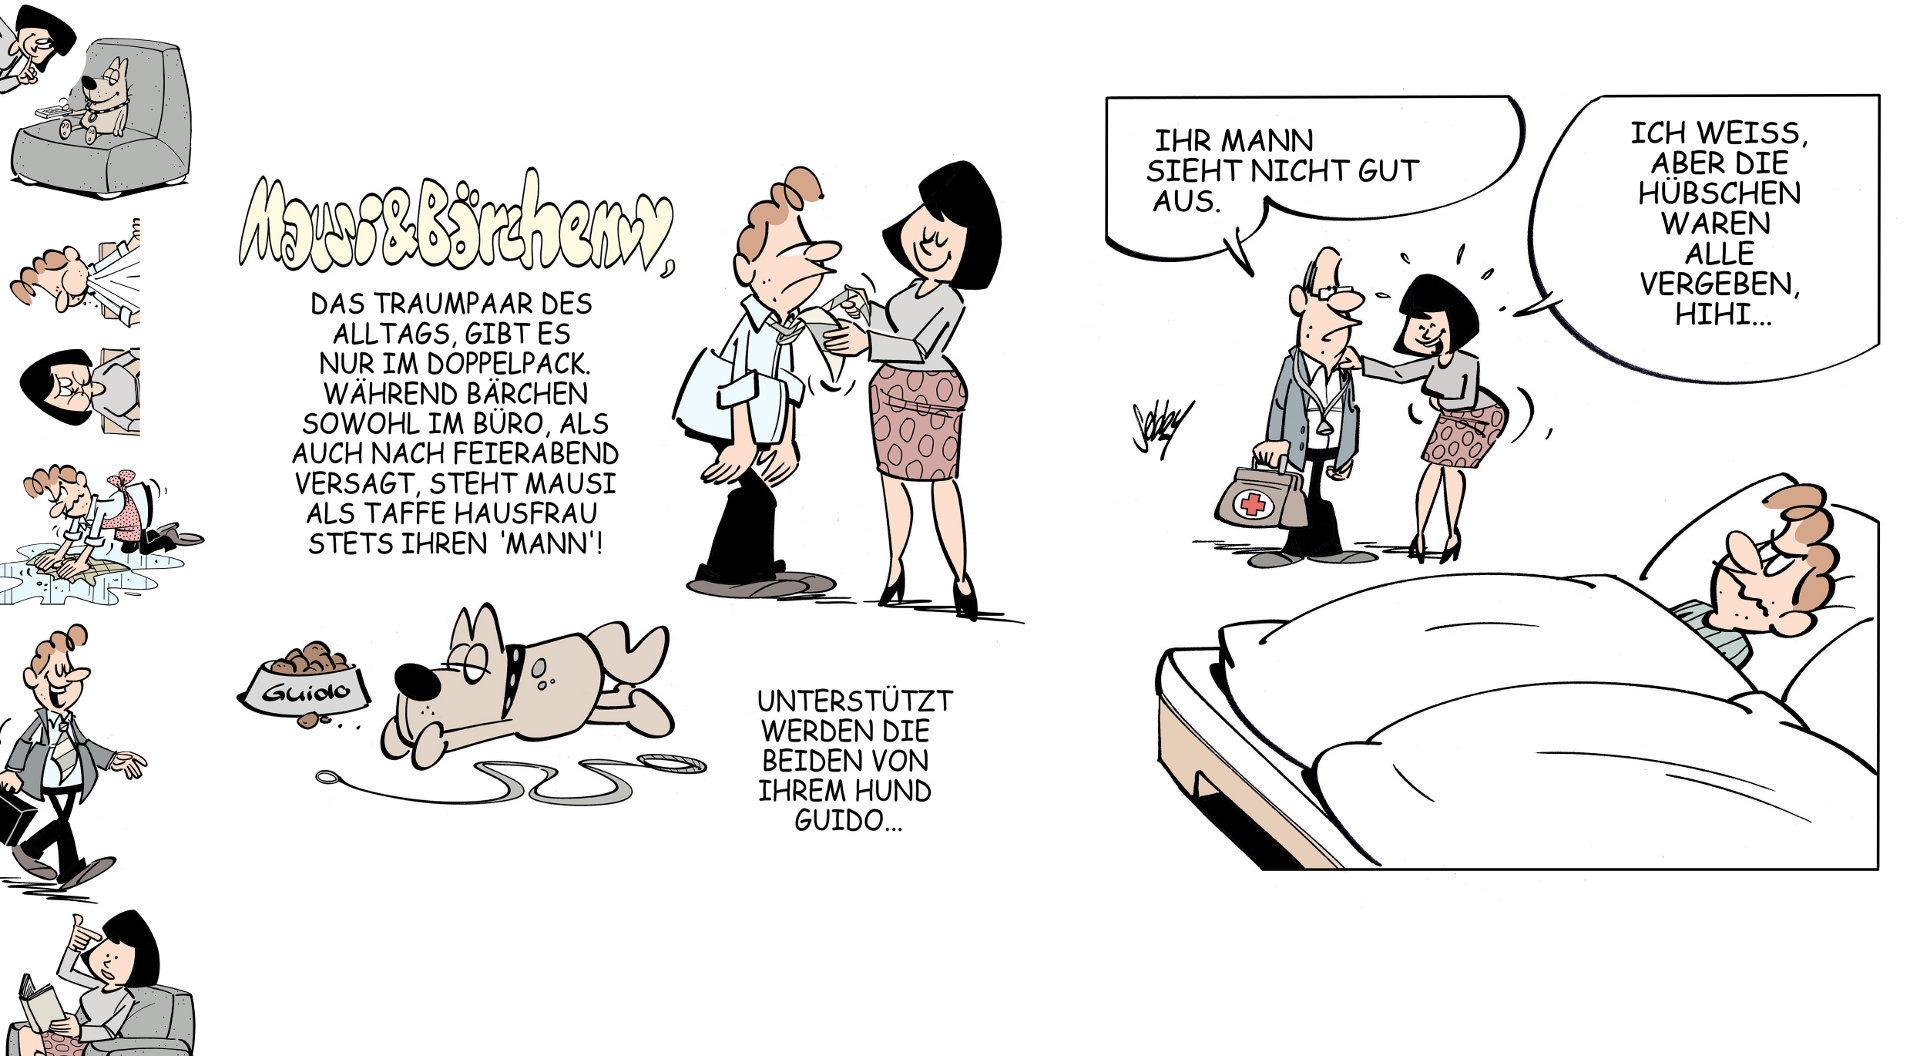 http://treworx.net/kunden/brandt-cartoons/mausibarchen.html